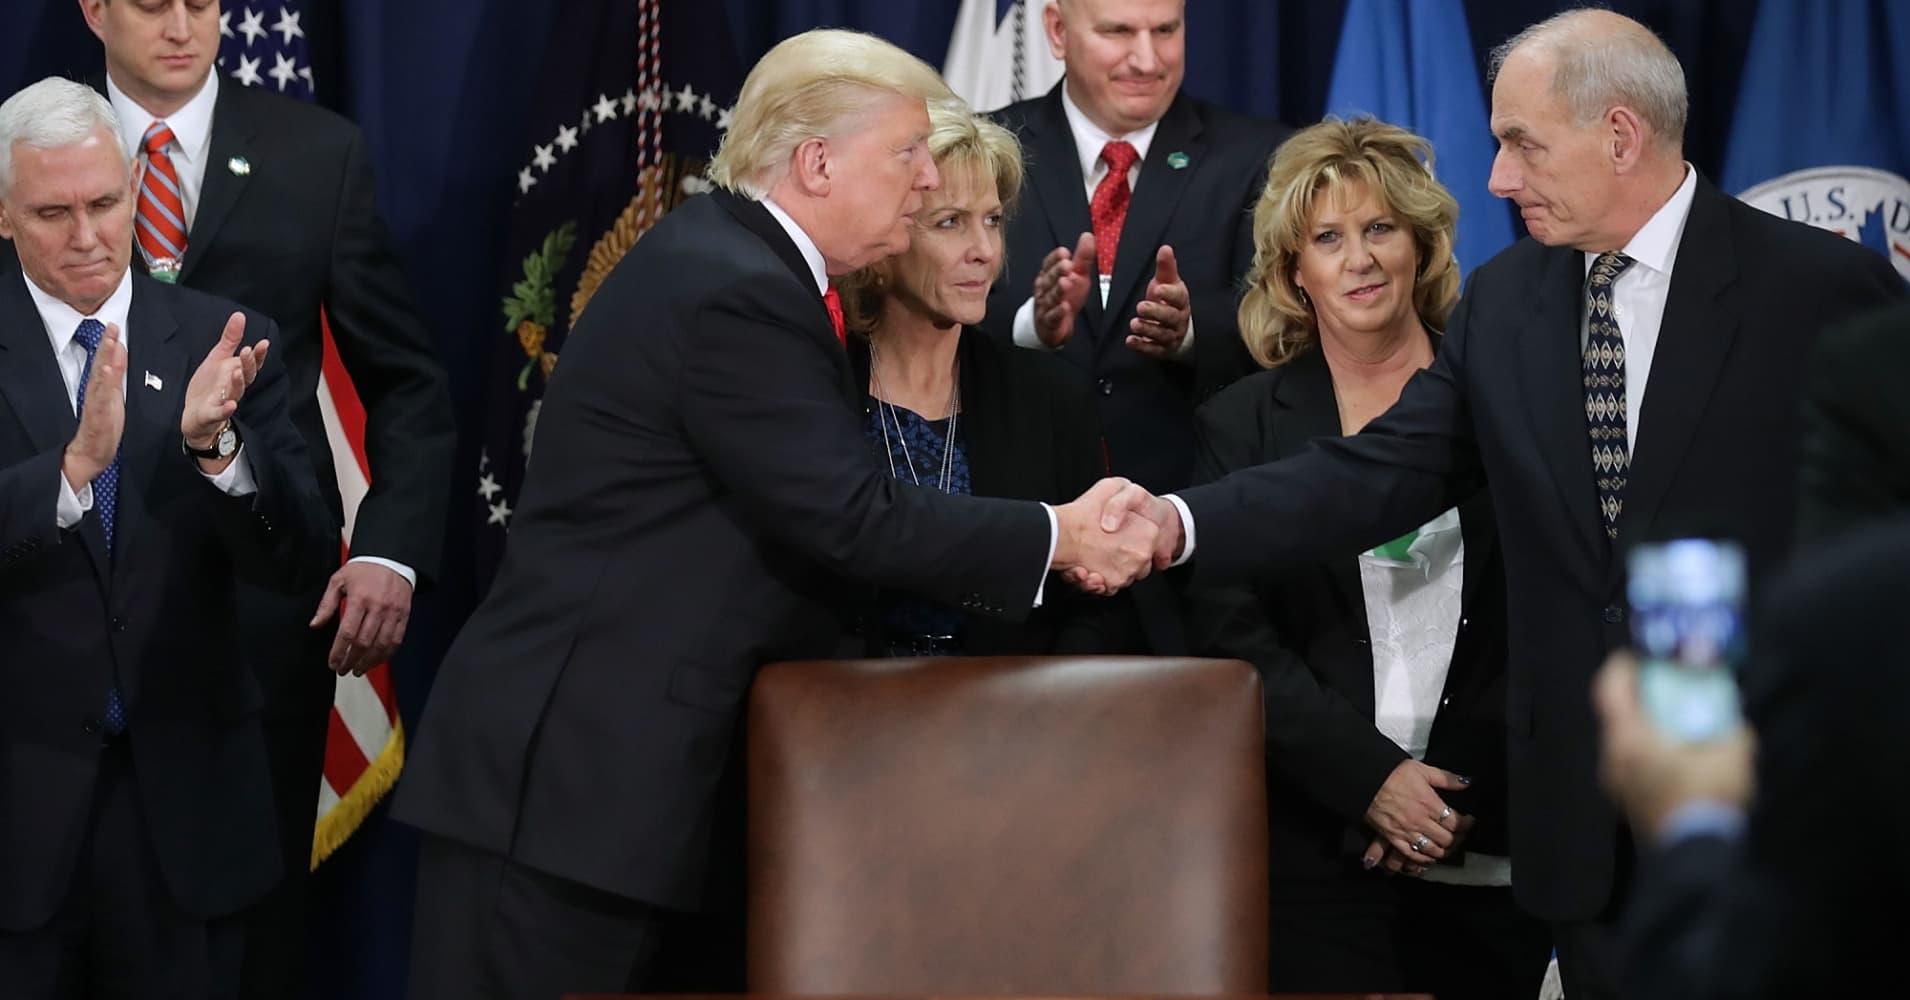 President Trump shakes hands with Homeland Security Secretary John Kelly